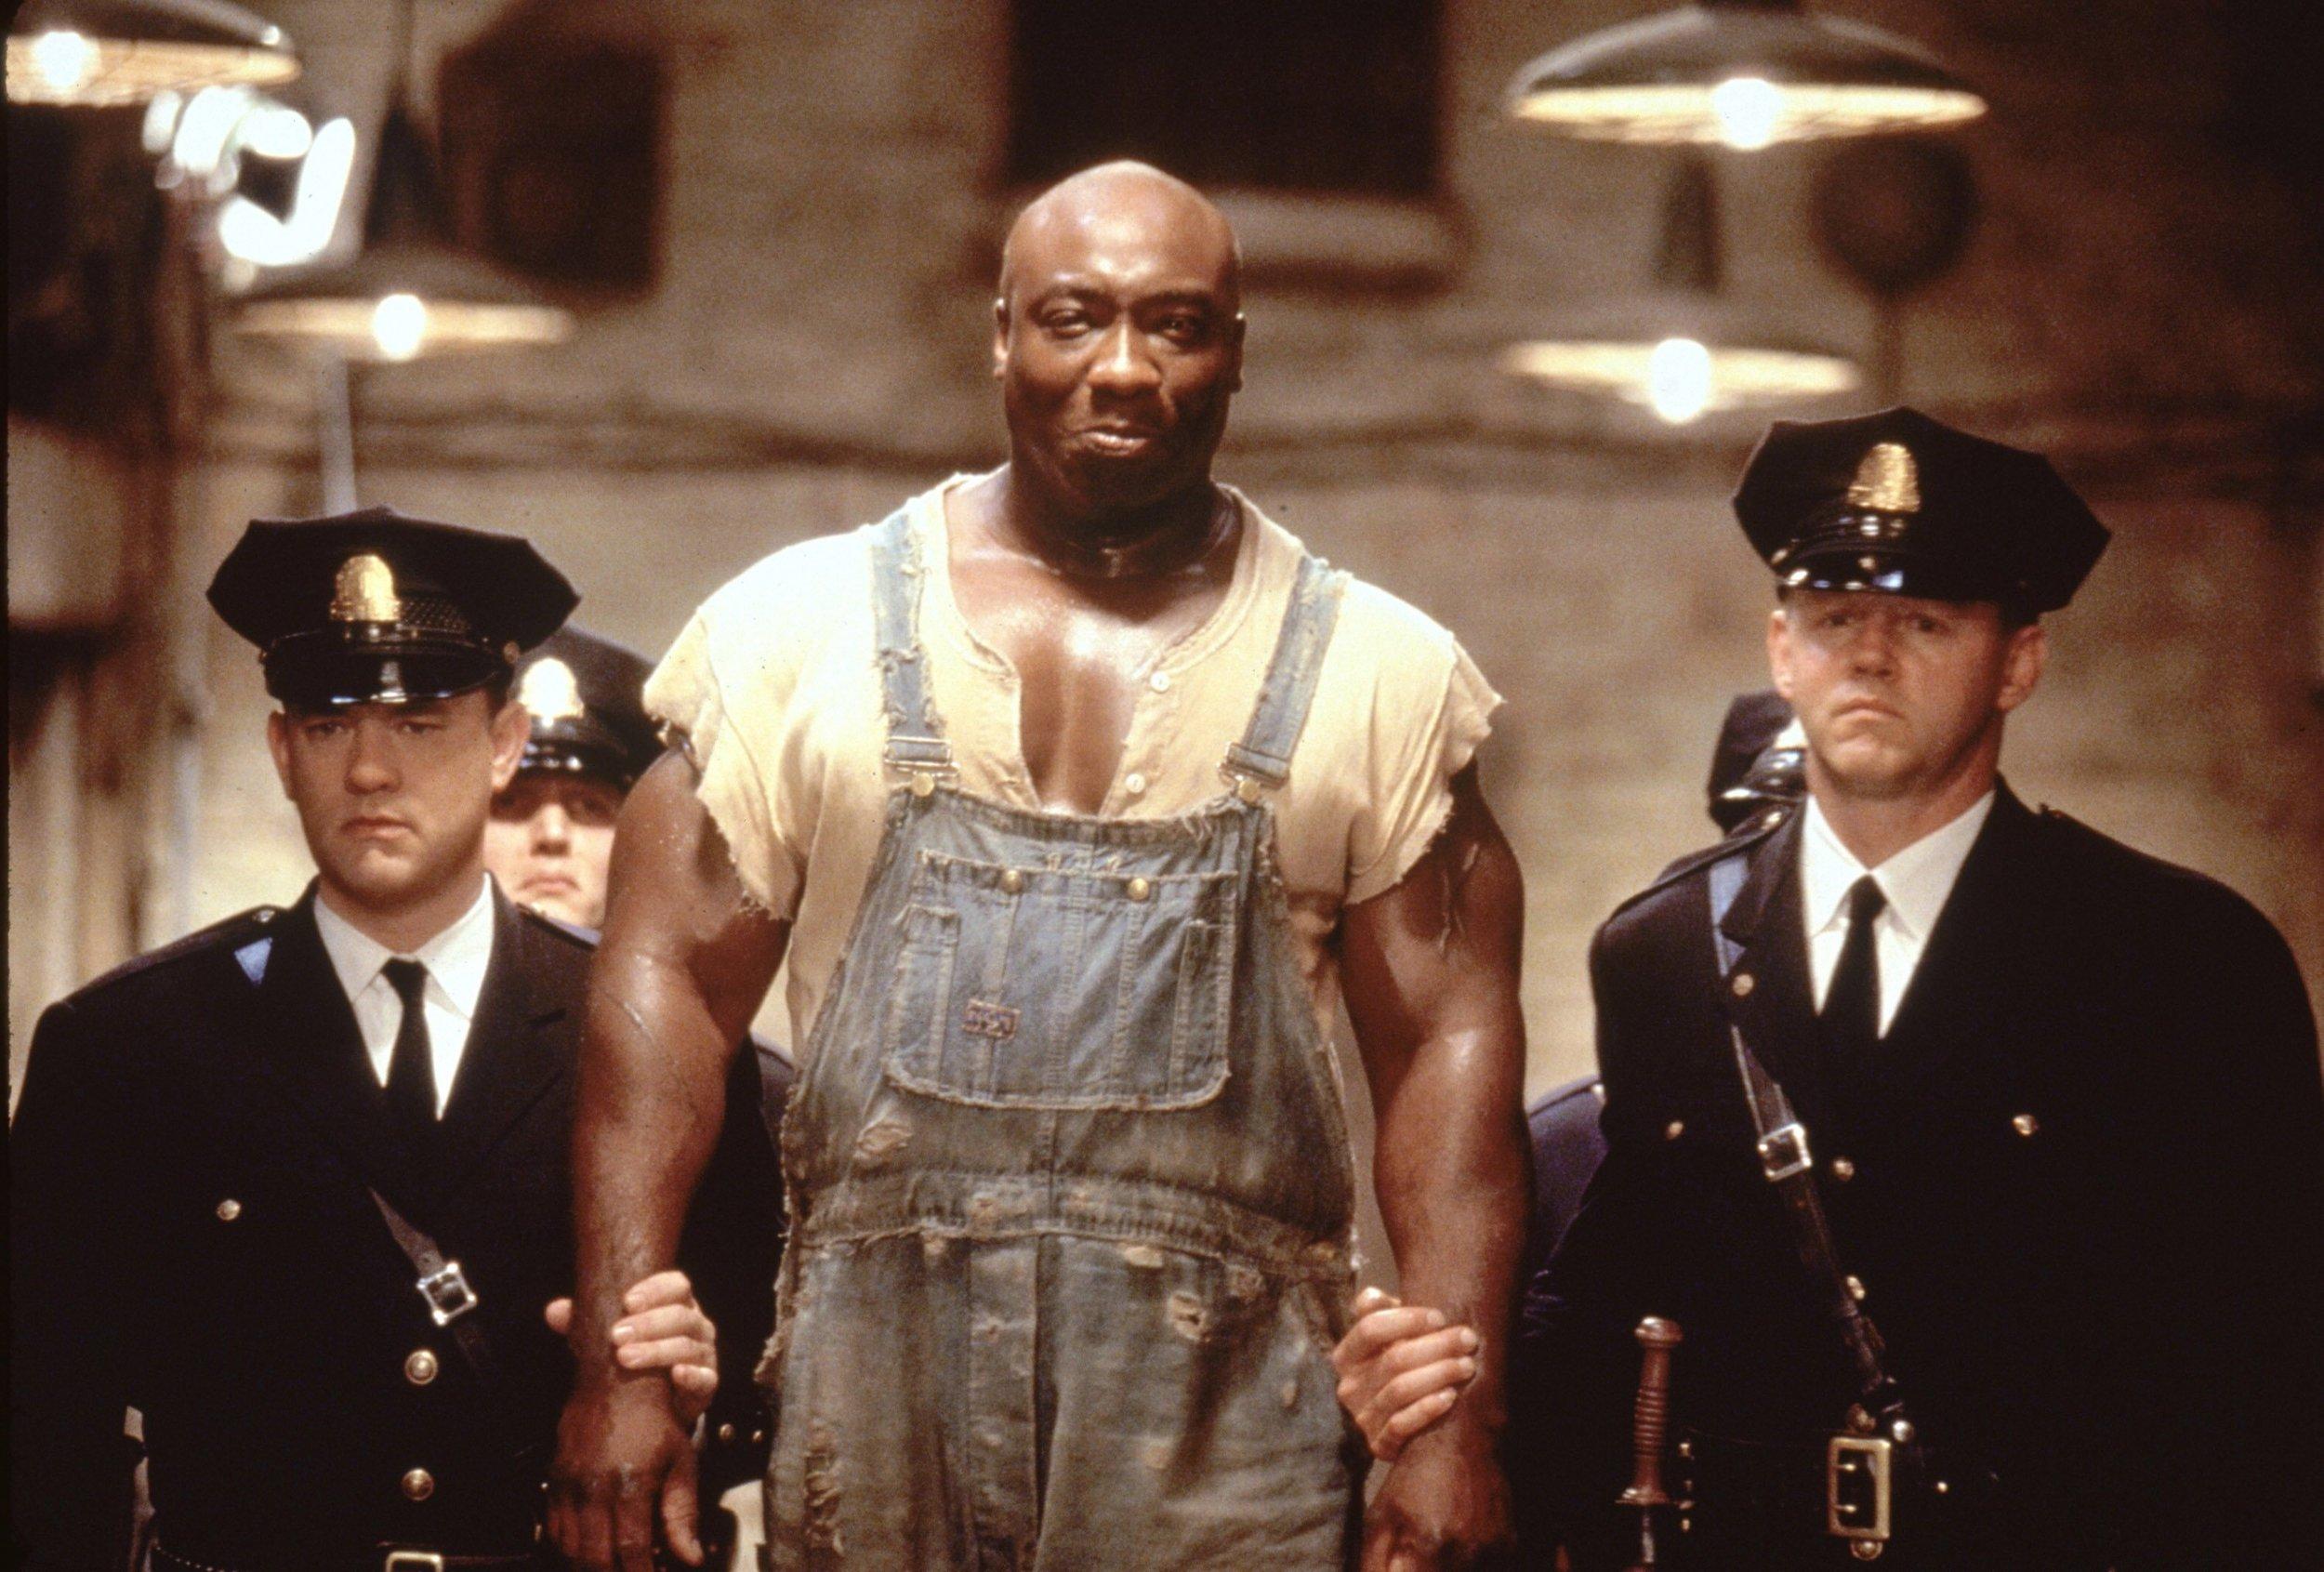 The Green Mile (1999) - Directed by: Frank DarabontWritten by: Stephen King (novel) & Frank Darabont